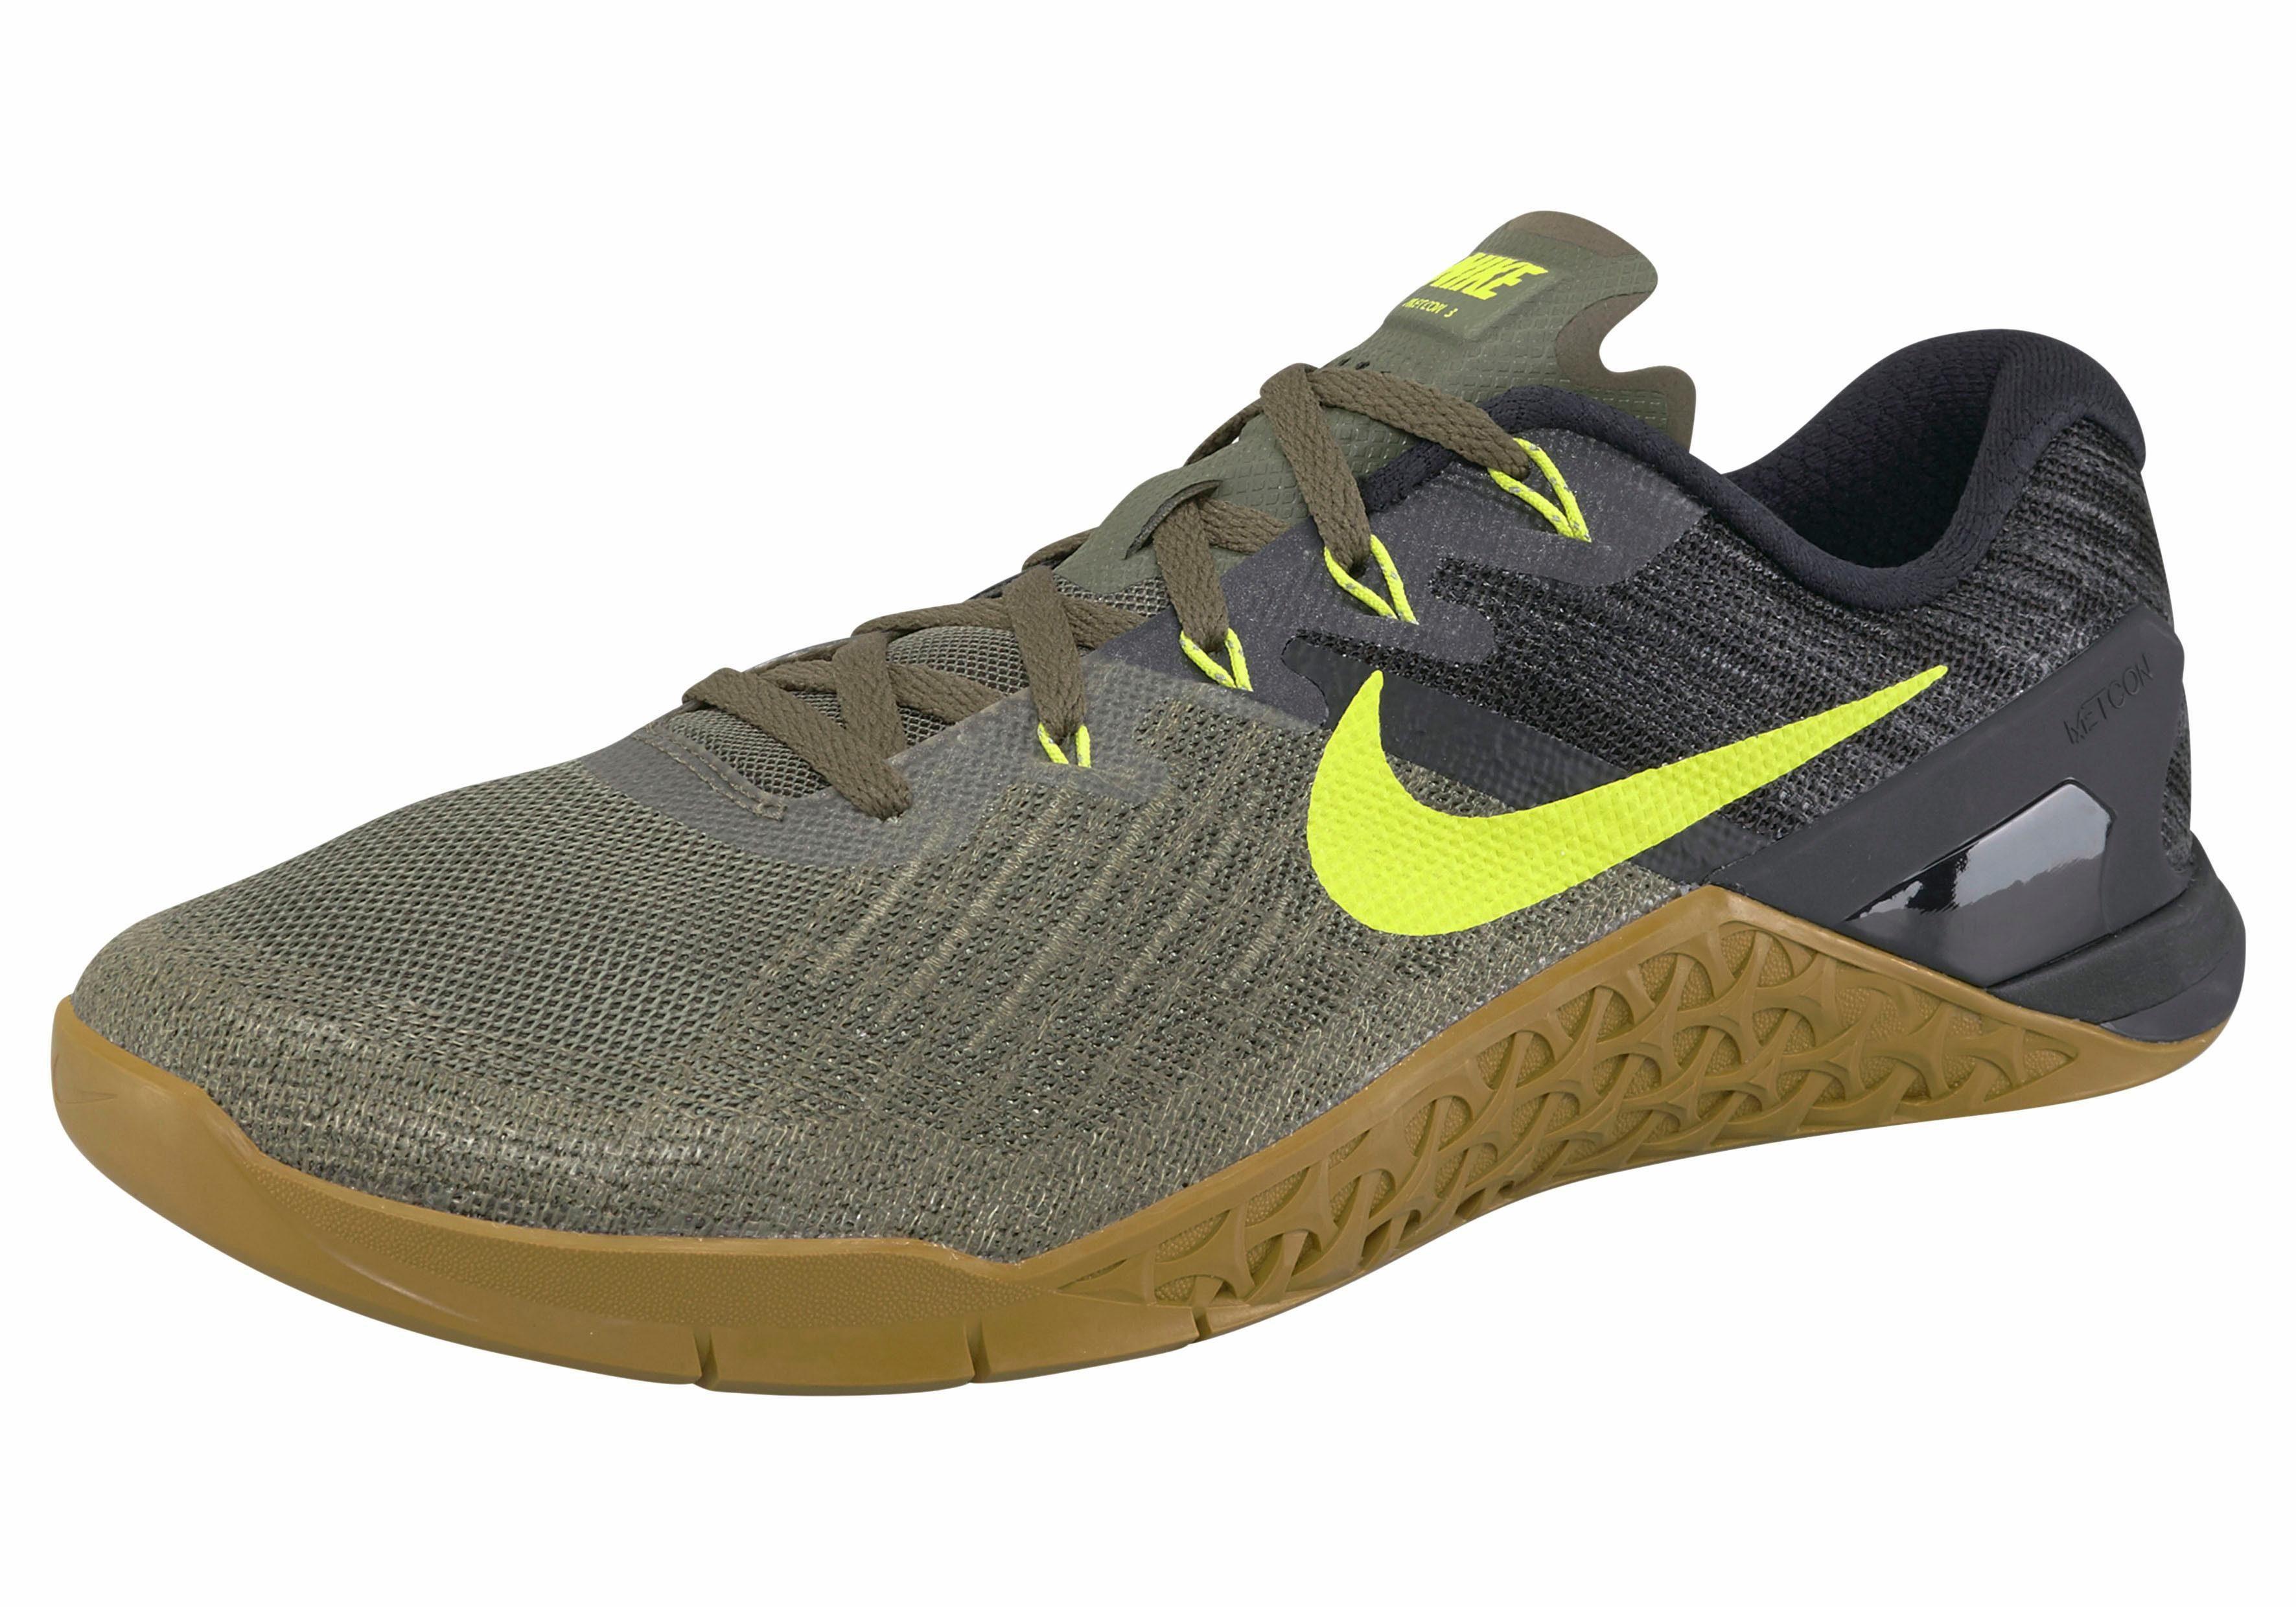 Nike Sportswear Metcon 3 Trainingsschuh kaufen  khaki-schwarz